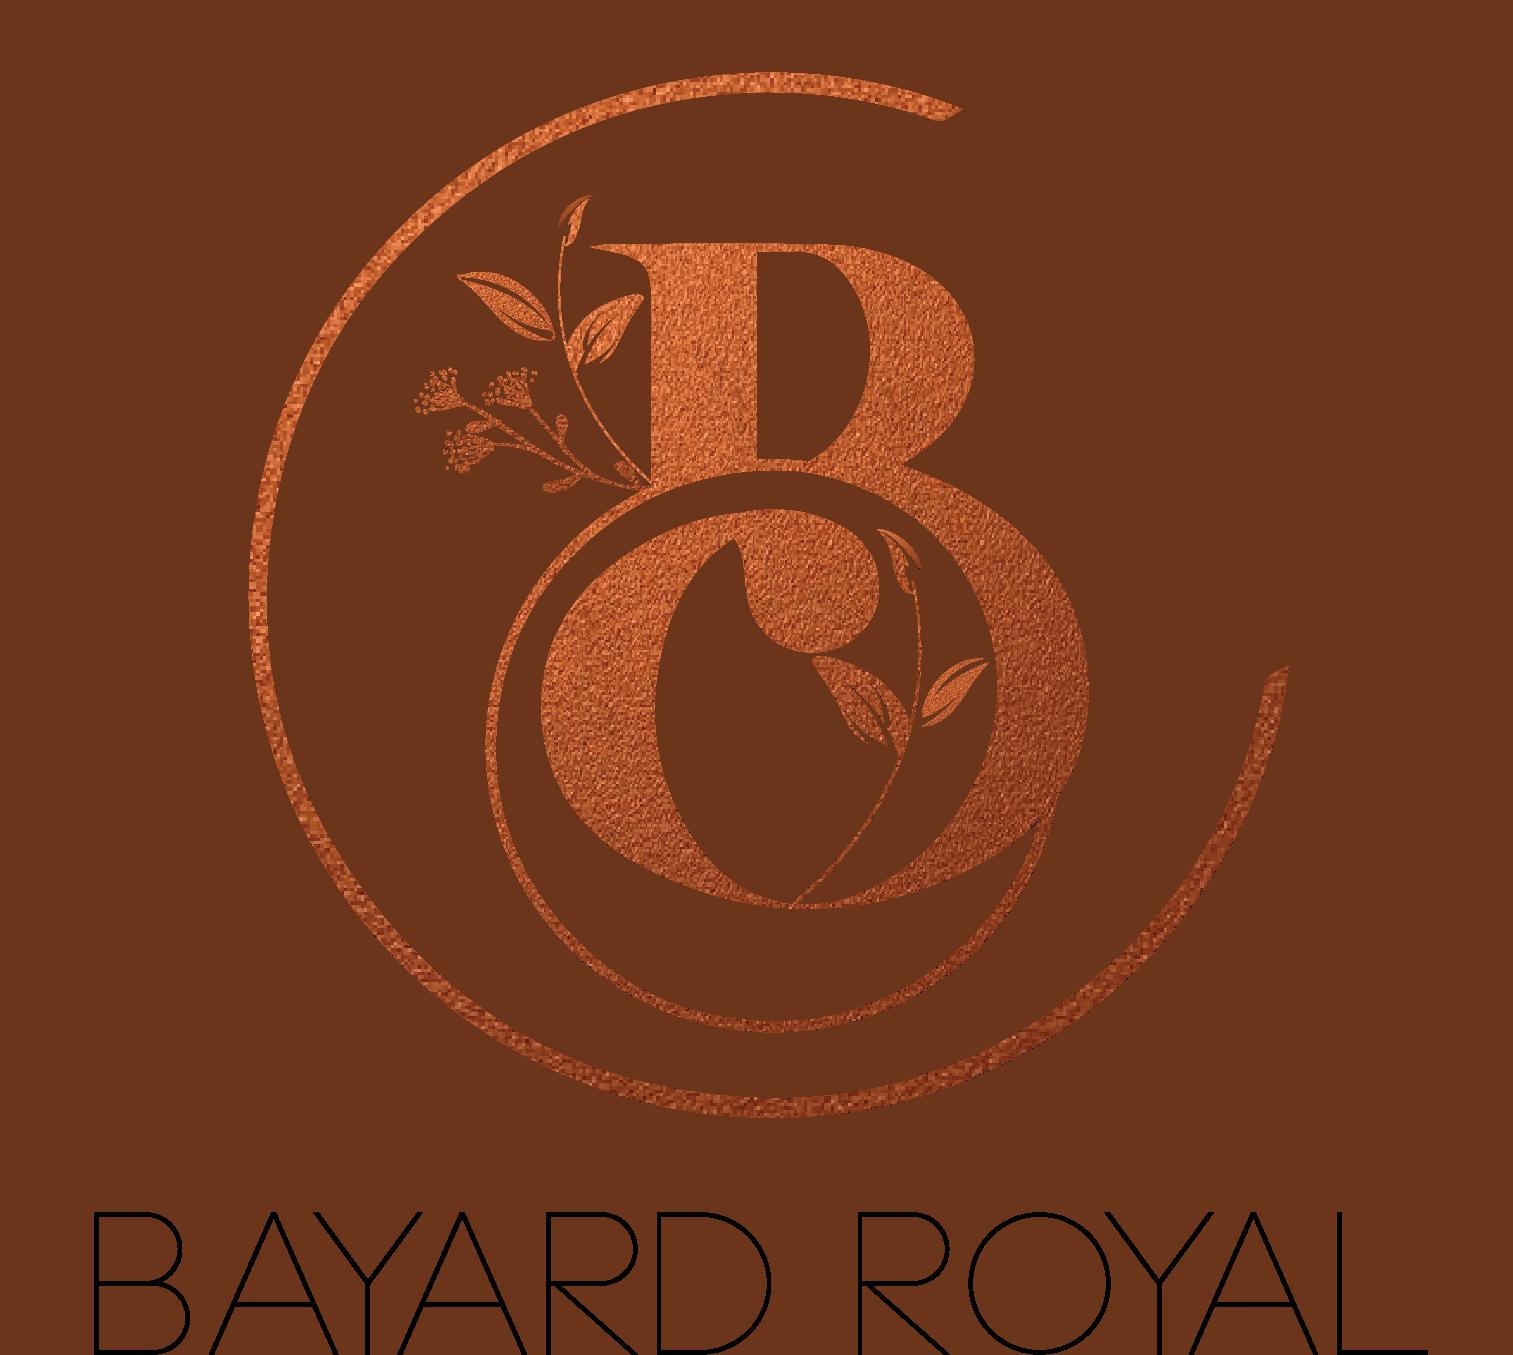 Bayard Royal